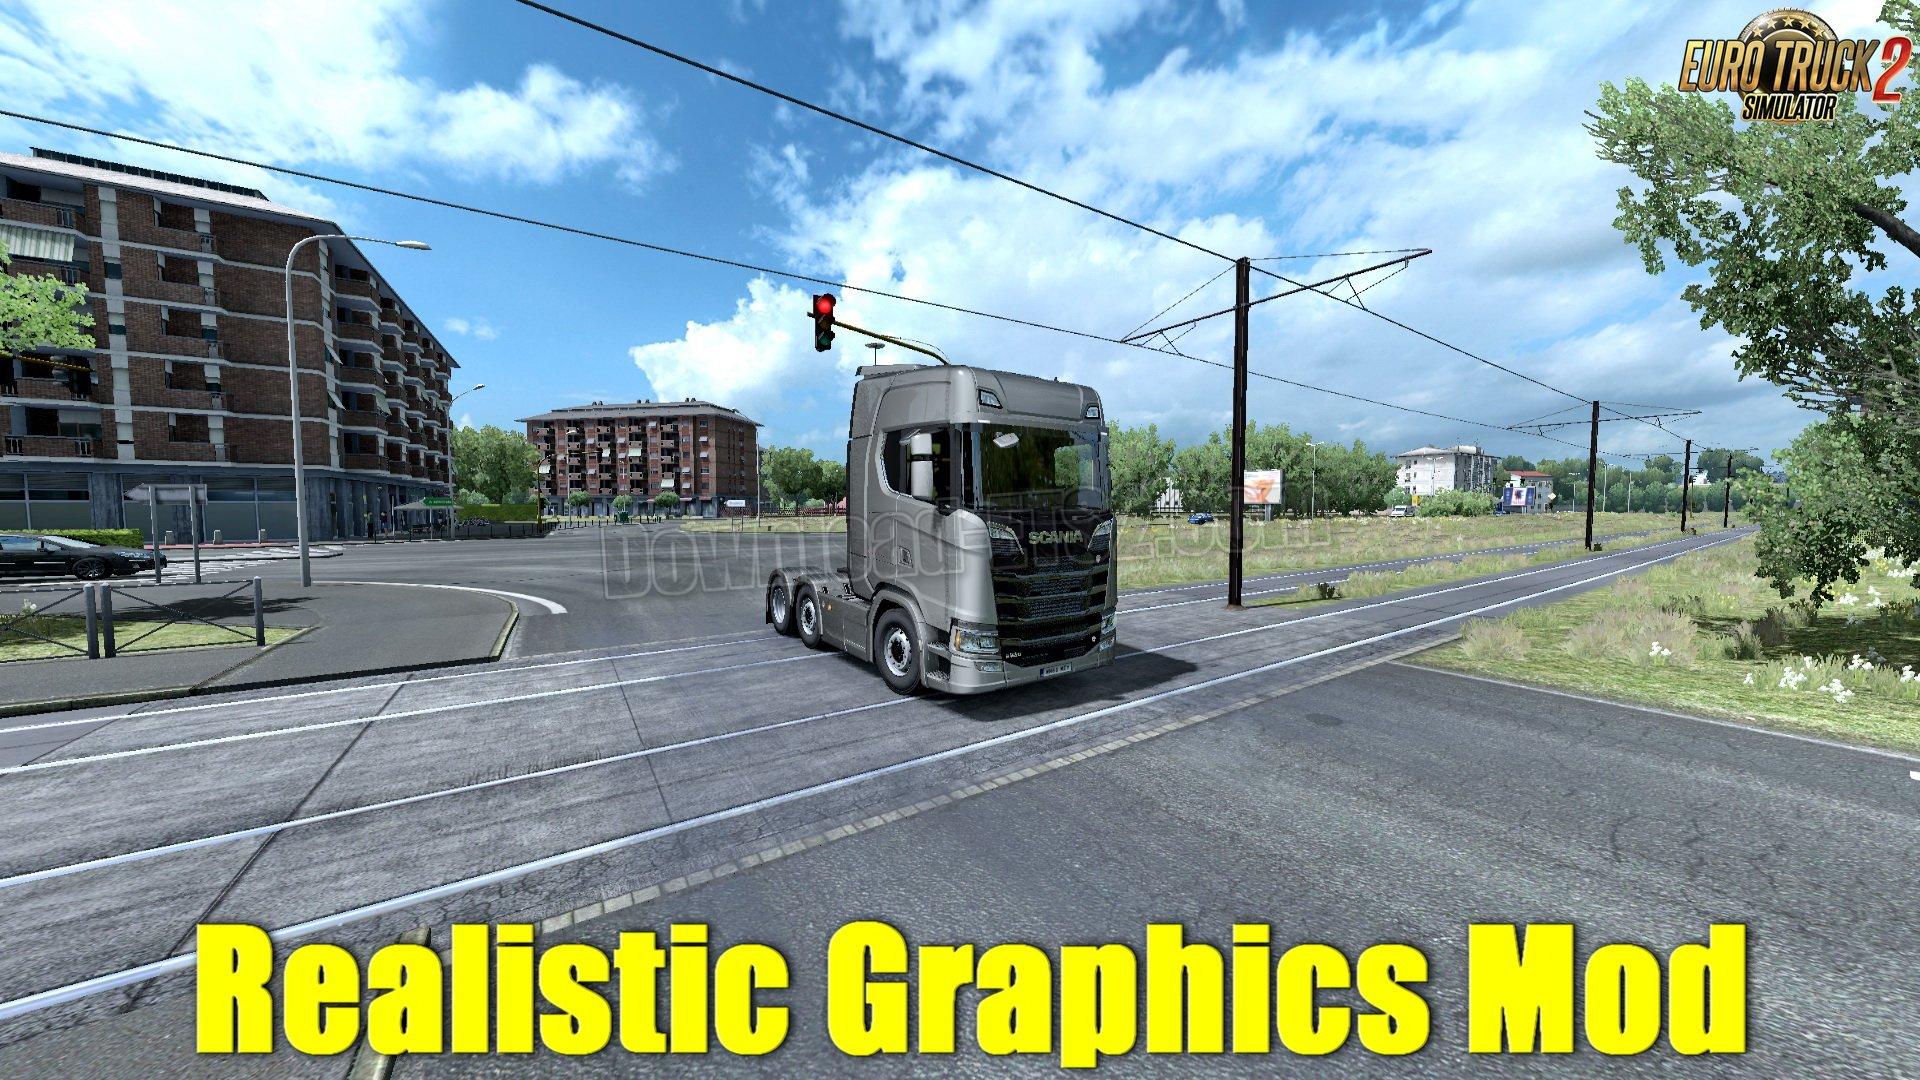 Download Realistic Graphics Mod v2 0 by Berat Afşin (1 32 x) for ETS